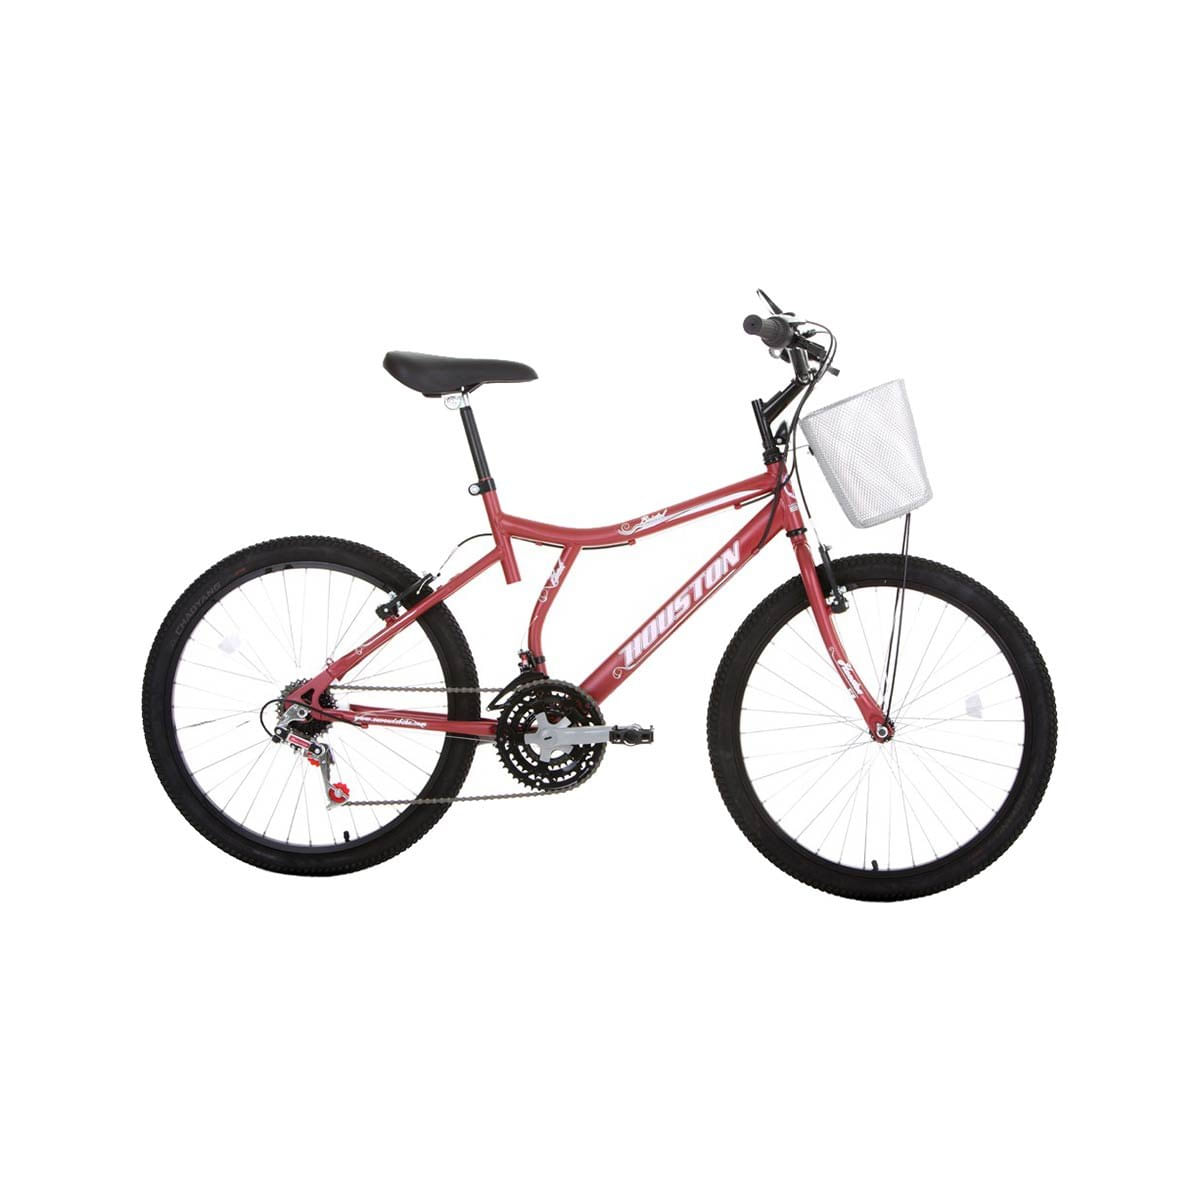 Imagem de Bicicleta Aro 24 Bristol Peak Houston